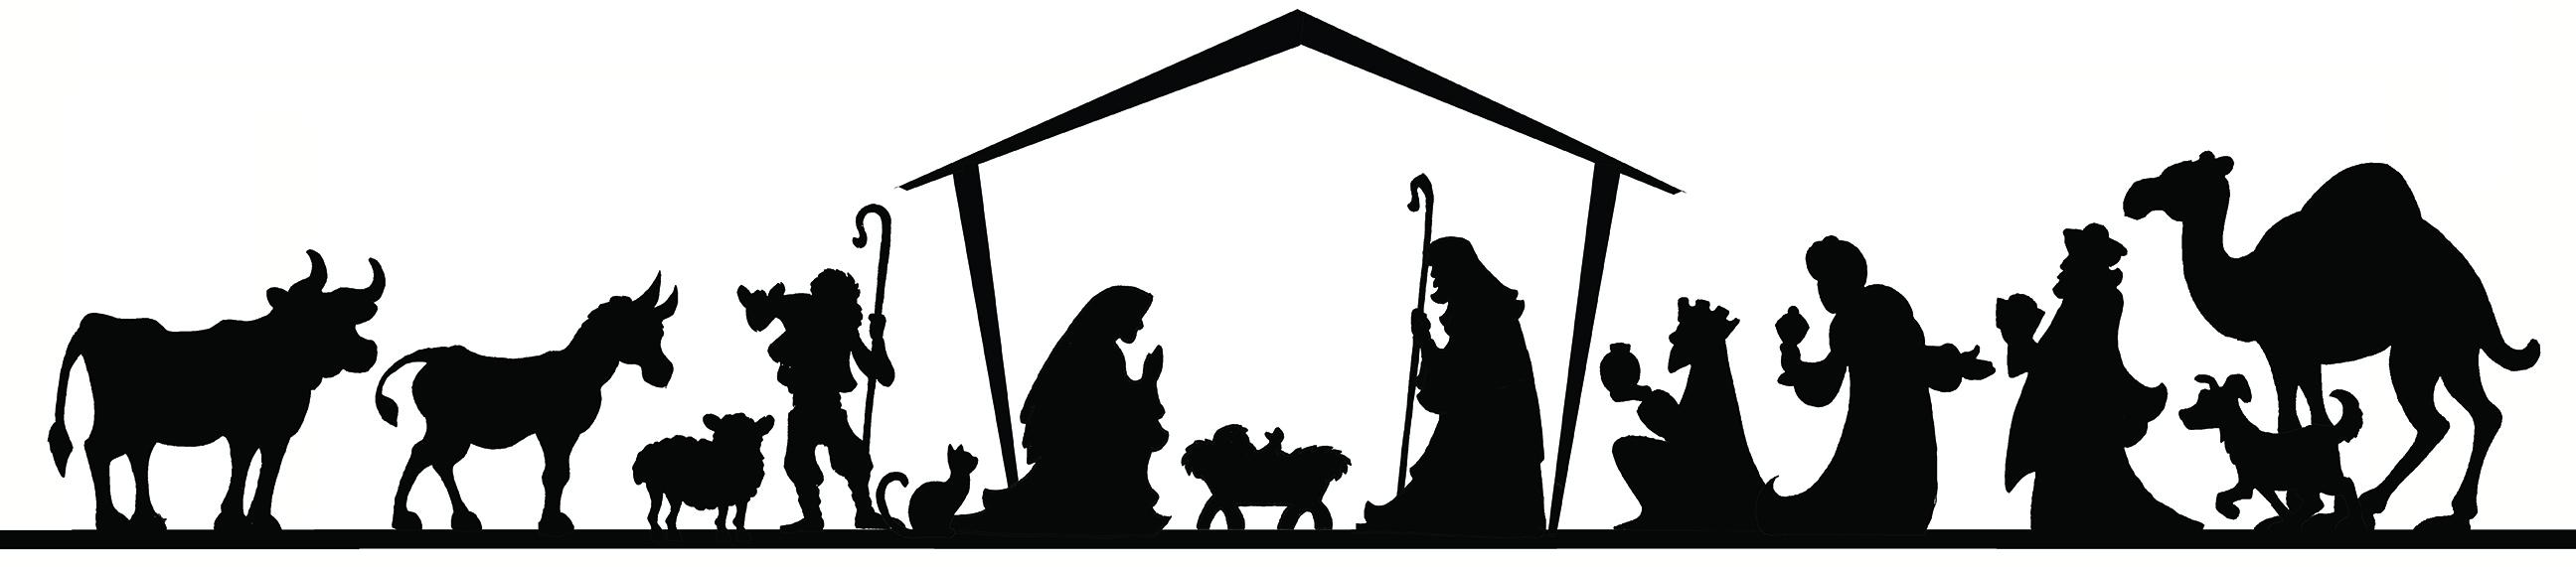 Live Nativity Scene Clipart.